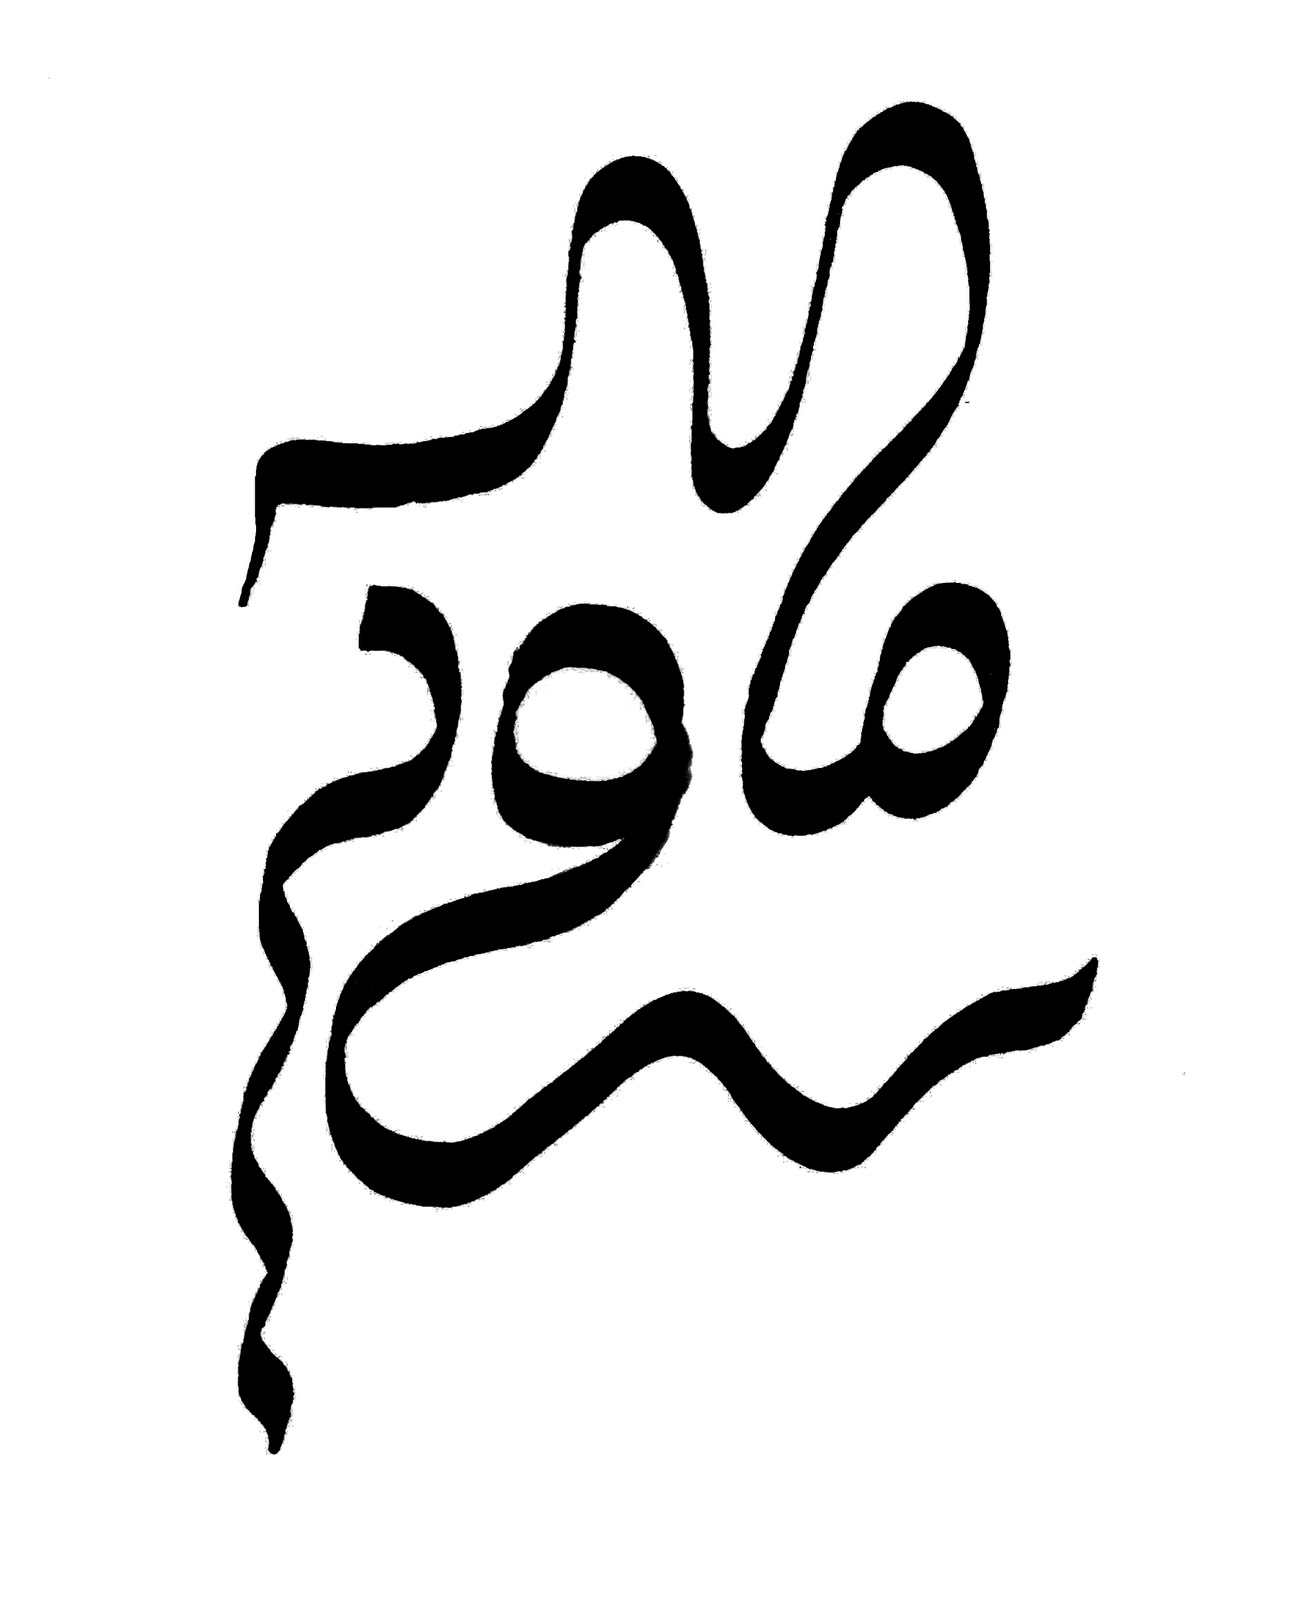 Arabic Calligraphy By Zana Wanzed